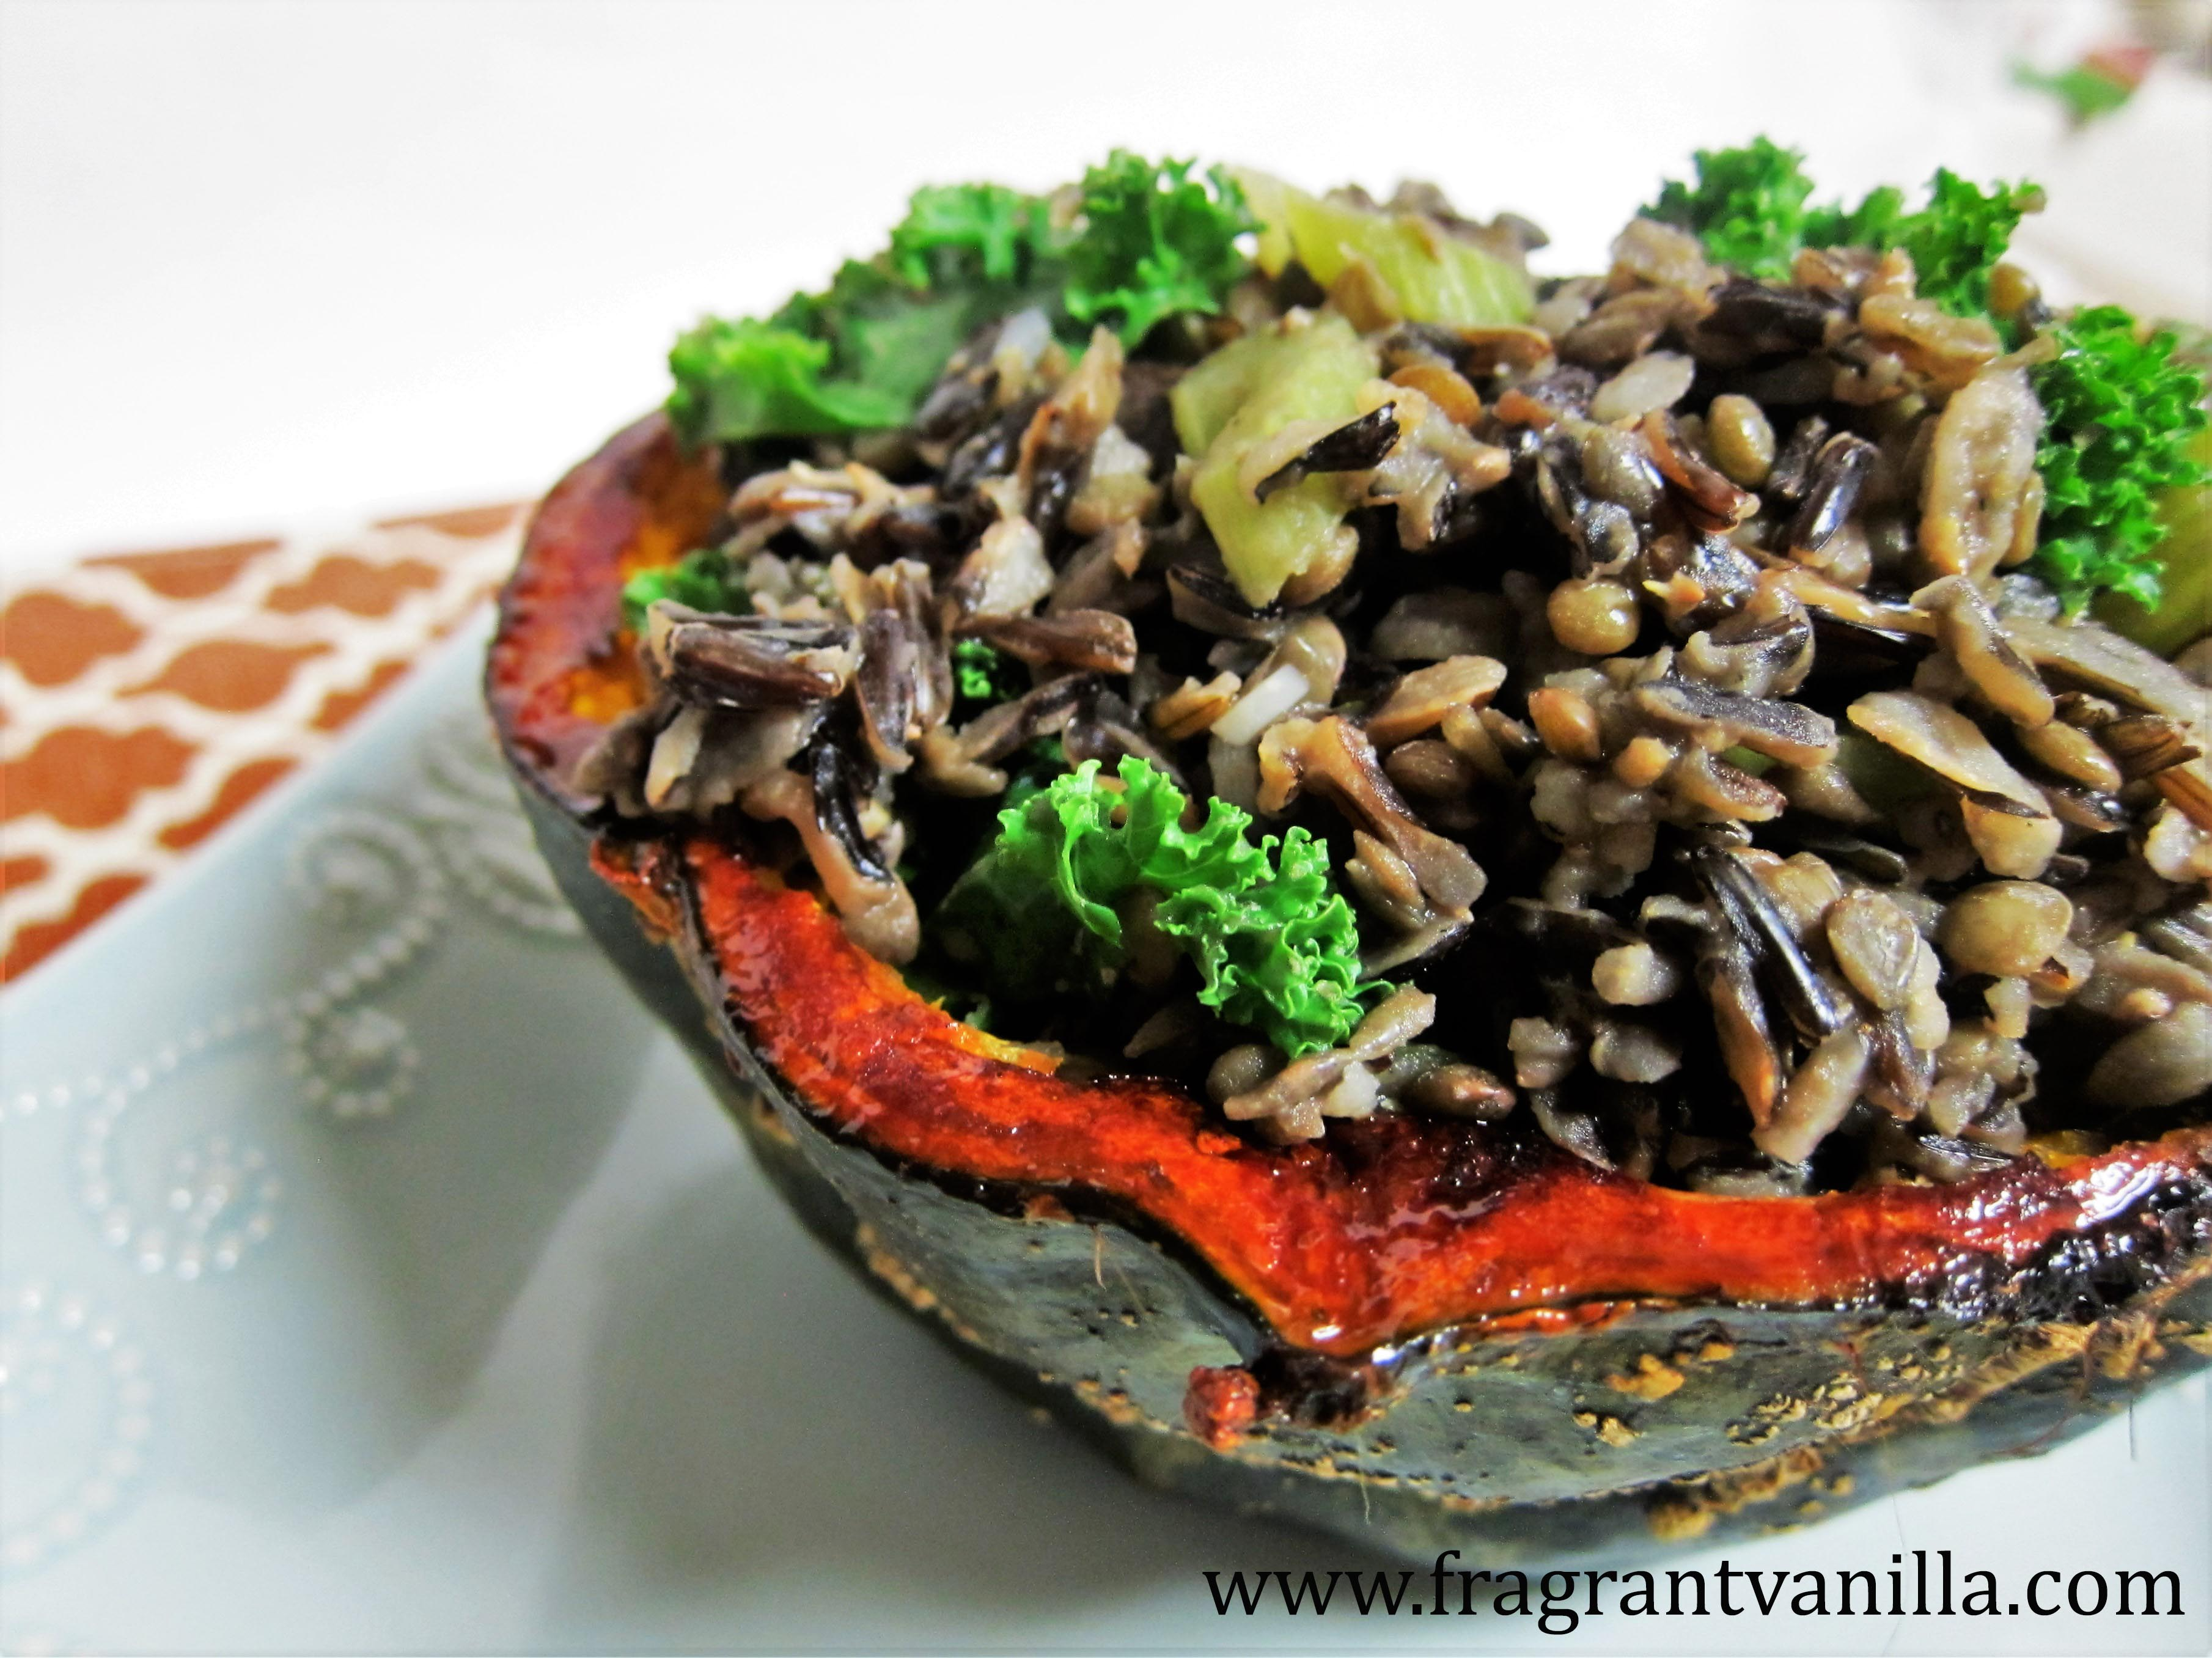 Savory Lentil and Wild Rice Stuffed Squash